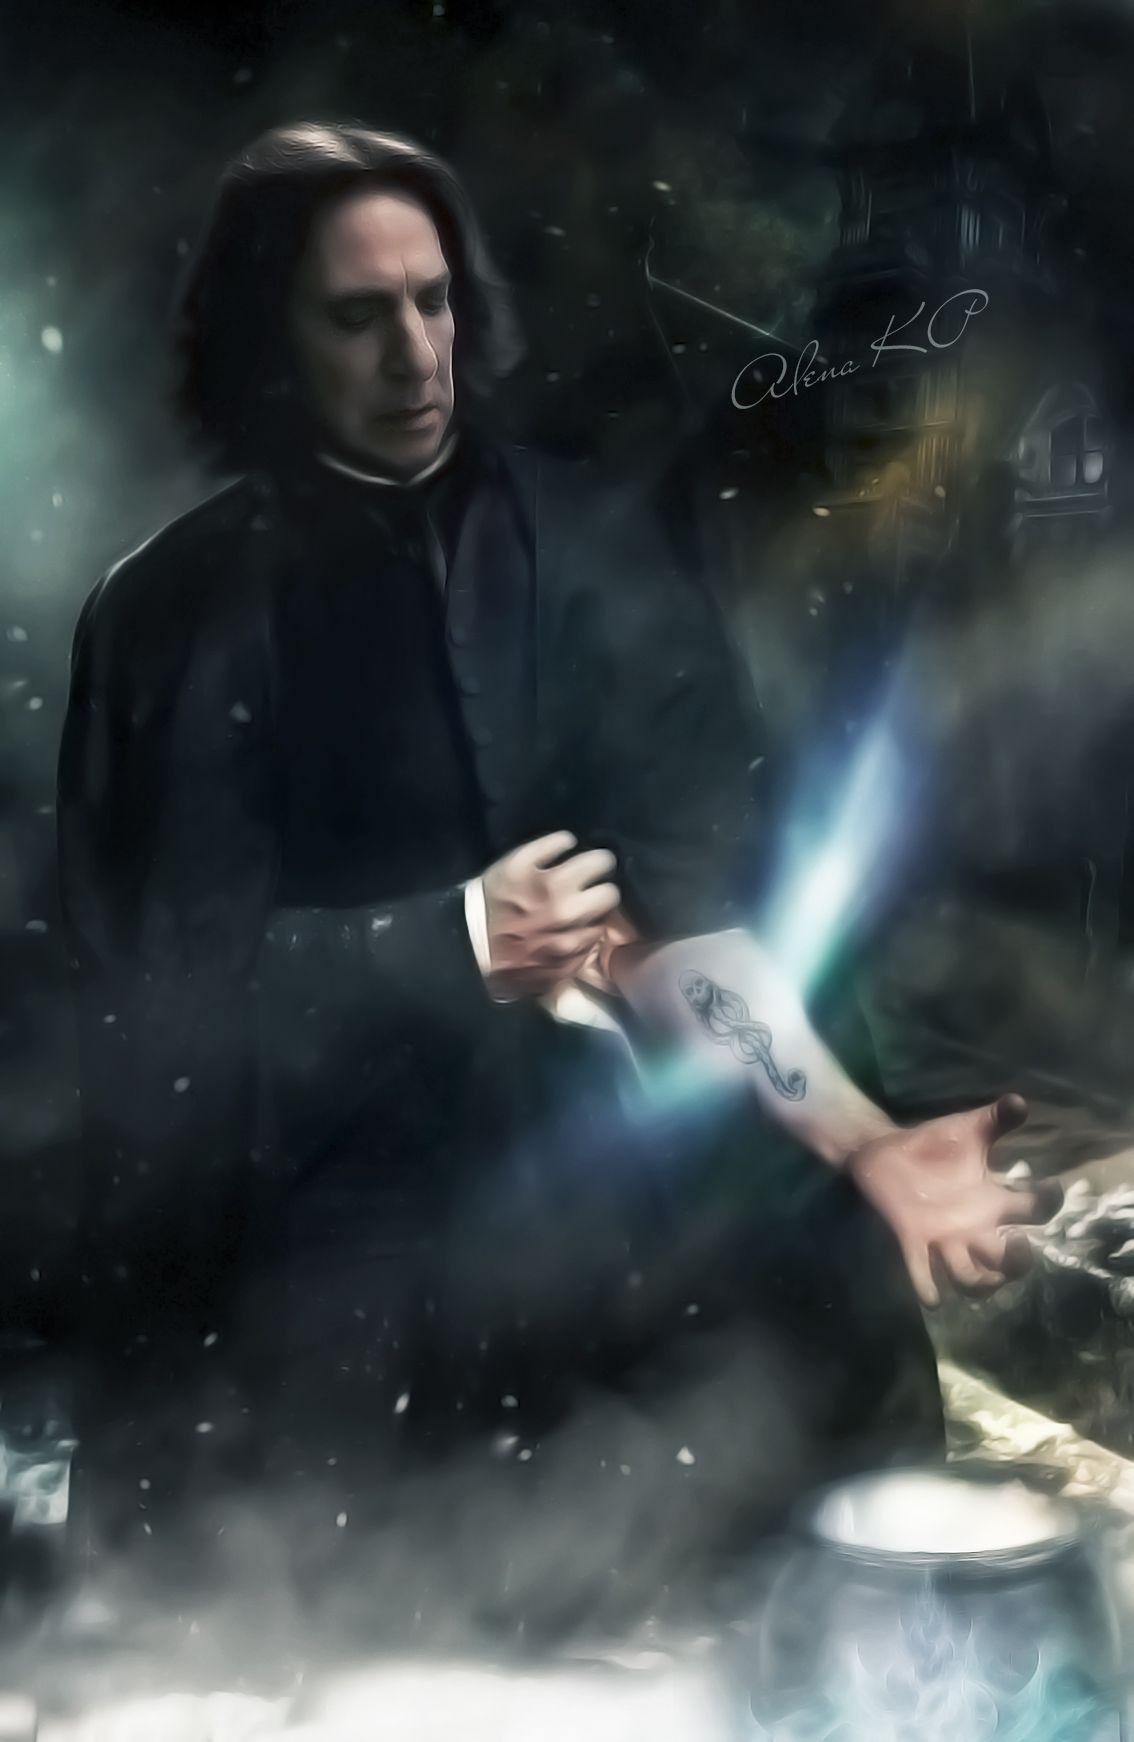 Alan Rickman Alena Kp Harry Potter Severus Snape Harry Potter Severus Severus Snape